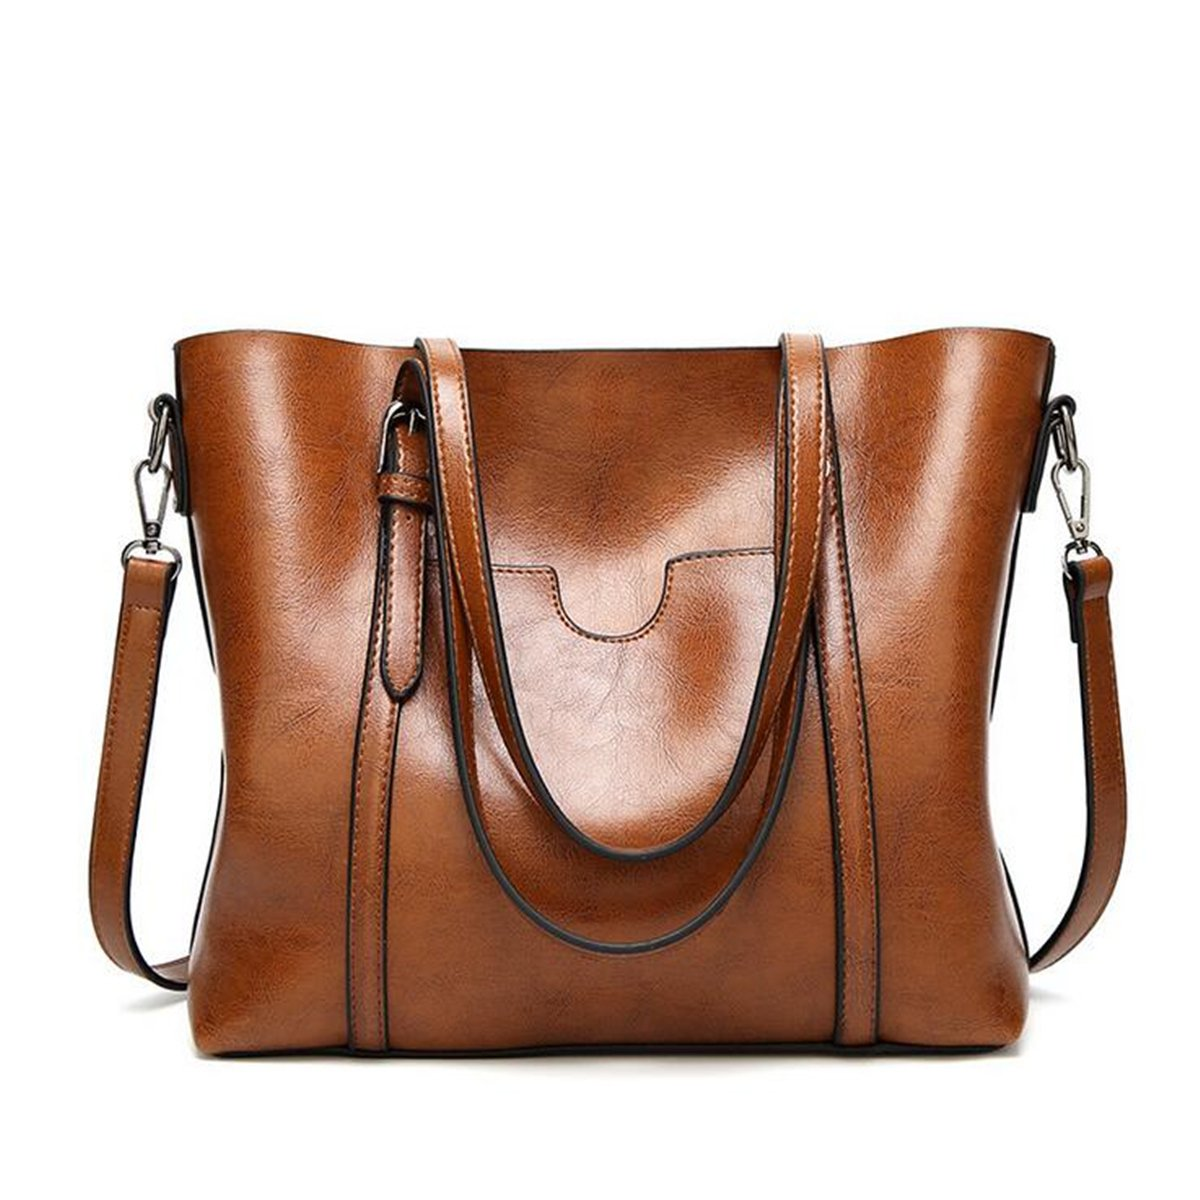 2c5811378f34 OURBAG Women Top Handle Satchel Handbags Shoulder Bag Tote Purse  OURBAGDrseewd19912 ...